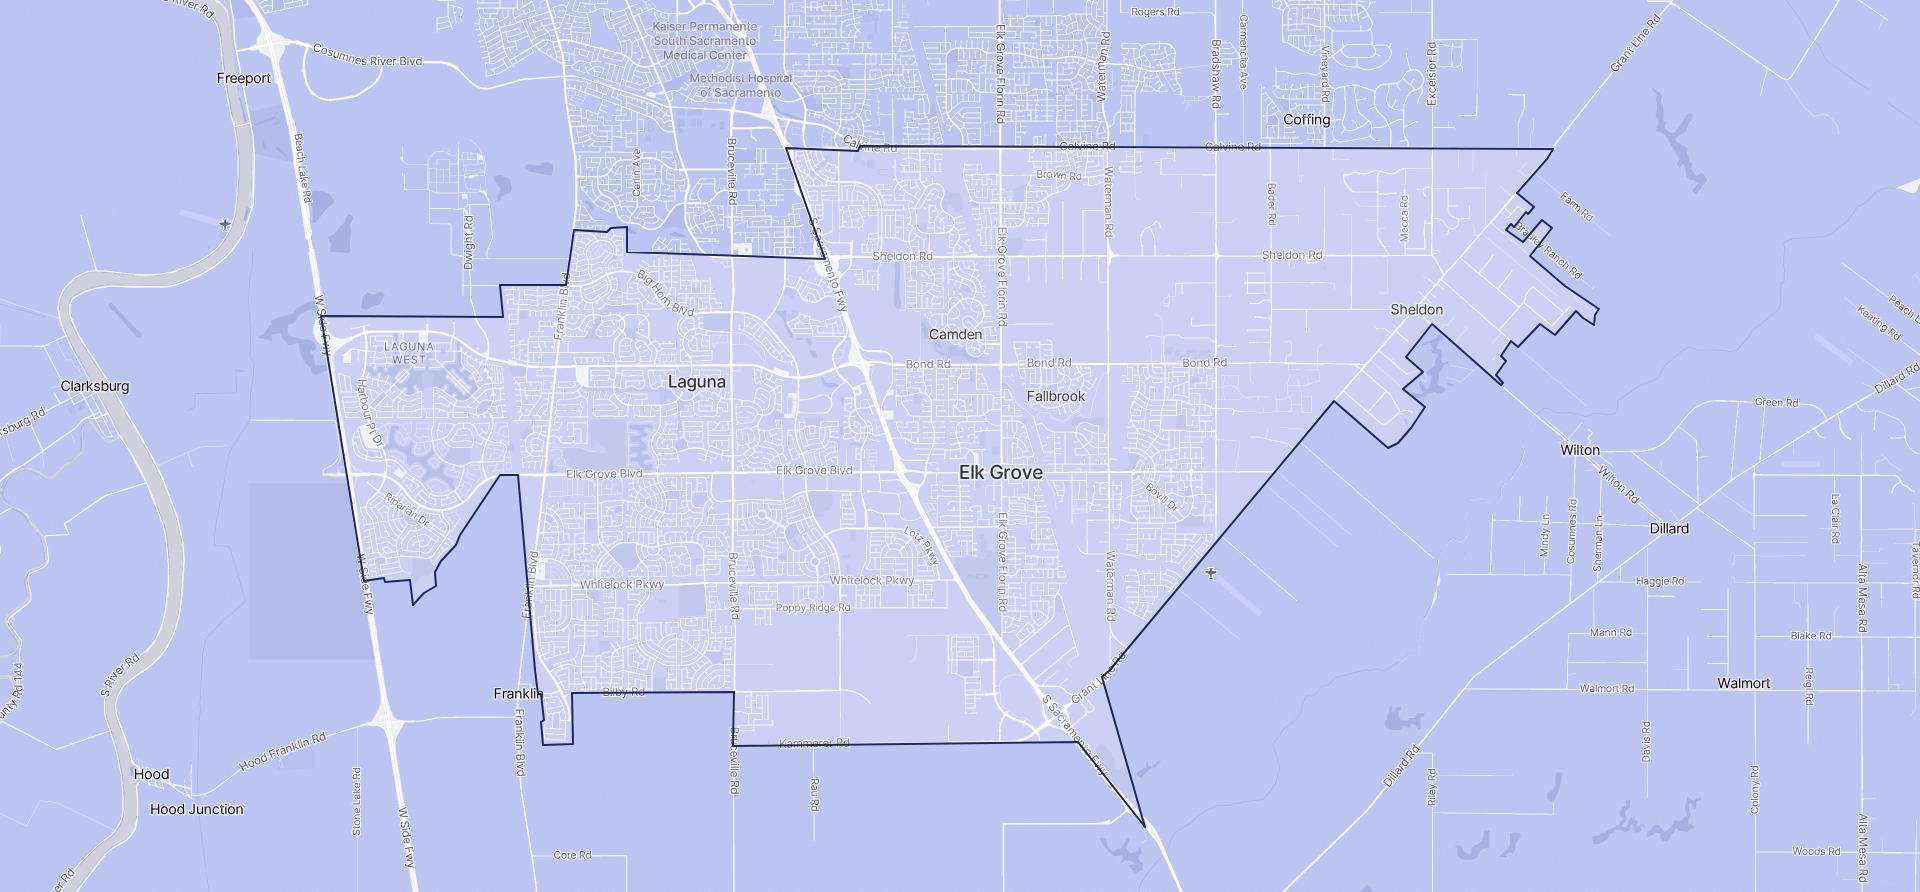 Image of Elk Grove boundaries on a map.